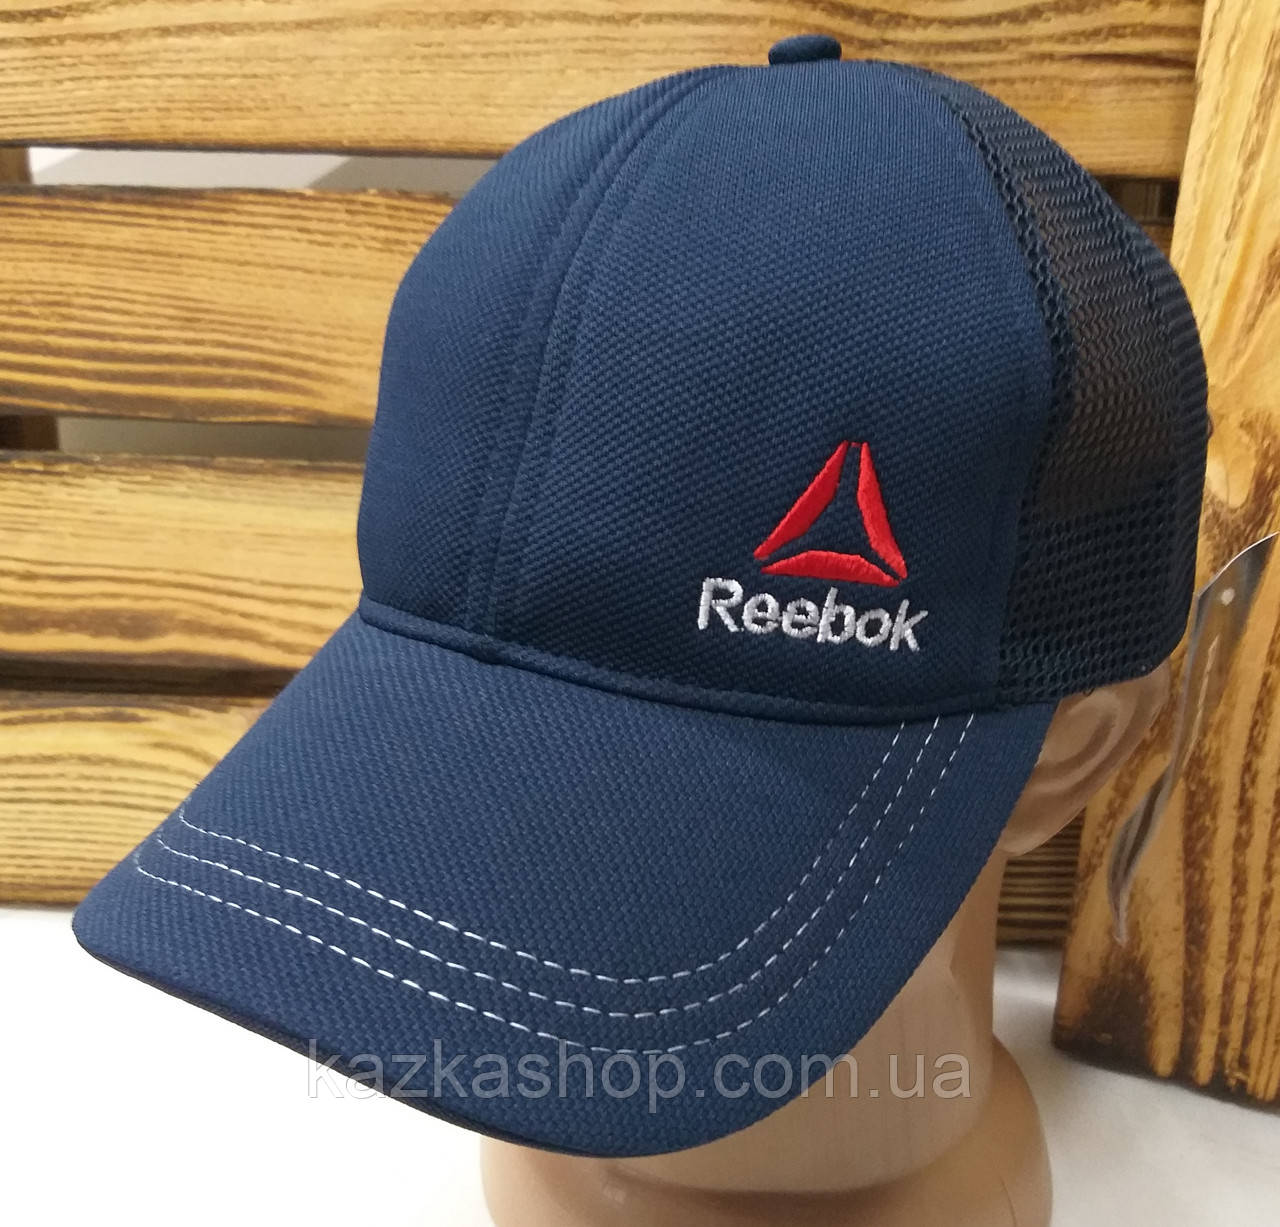 Мужская кепка, тракер, сзади сетка, вышивка в стиле Reebok (реплика), размер 54-56, на регуляторе